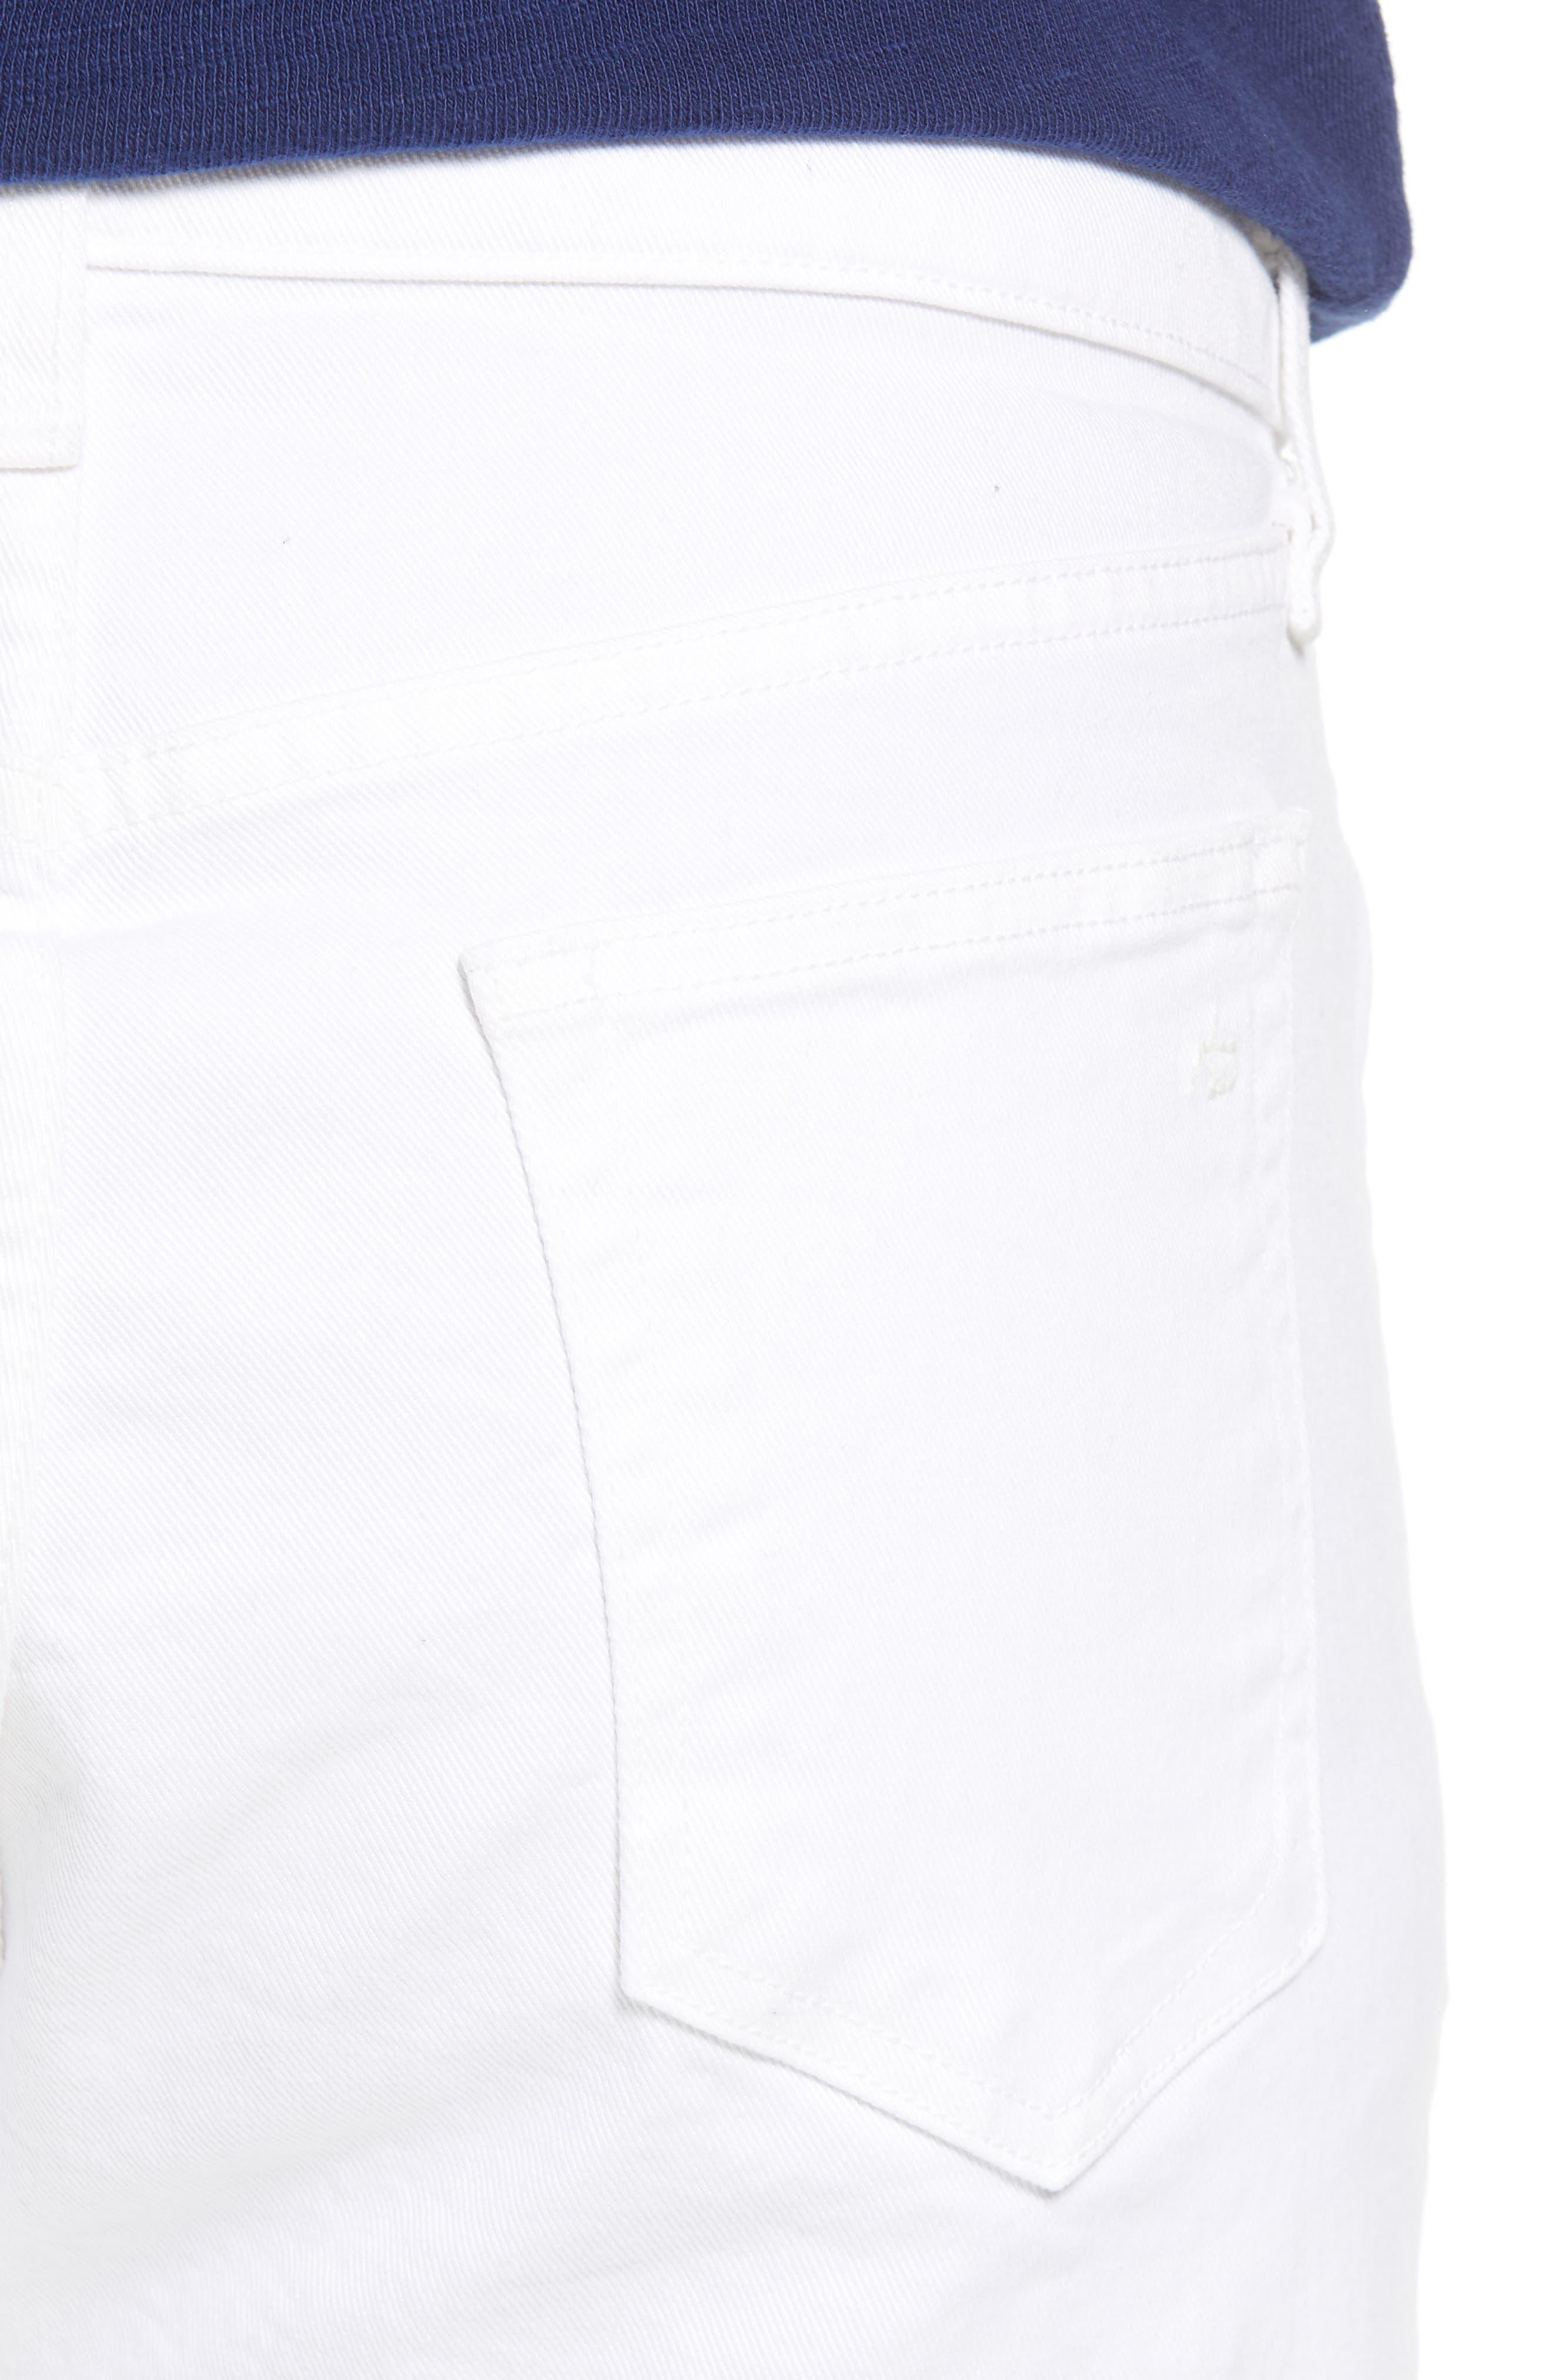 Fit 2 Slim Fit Jeans,                             Alternate thumbnail 4, color,                             White